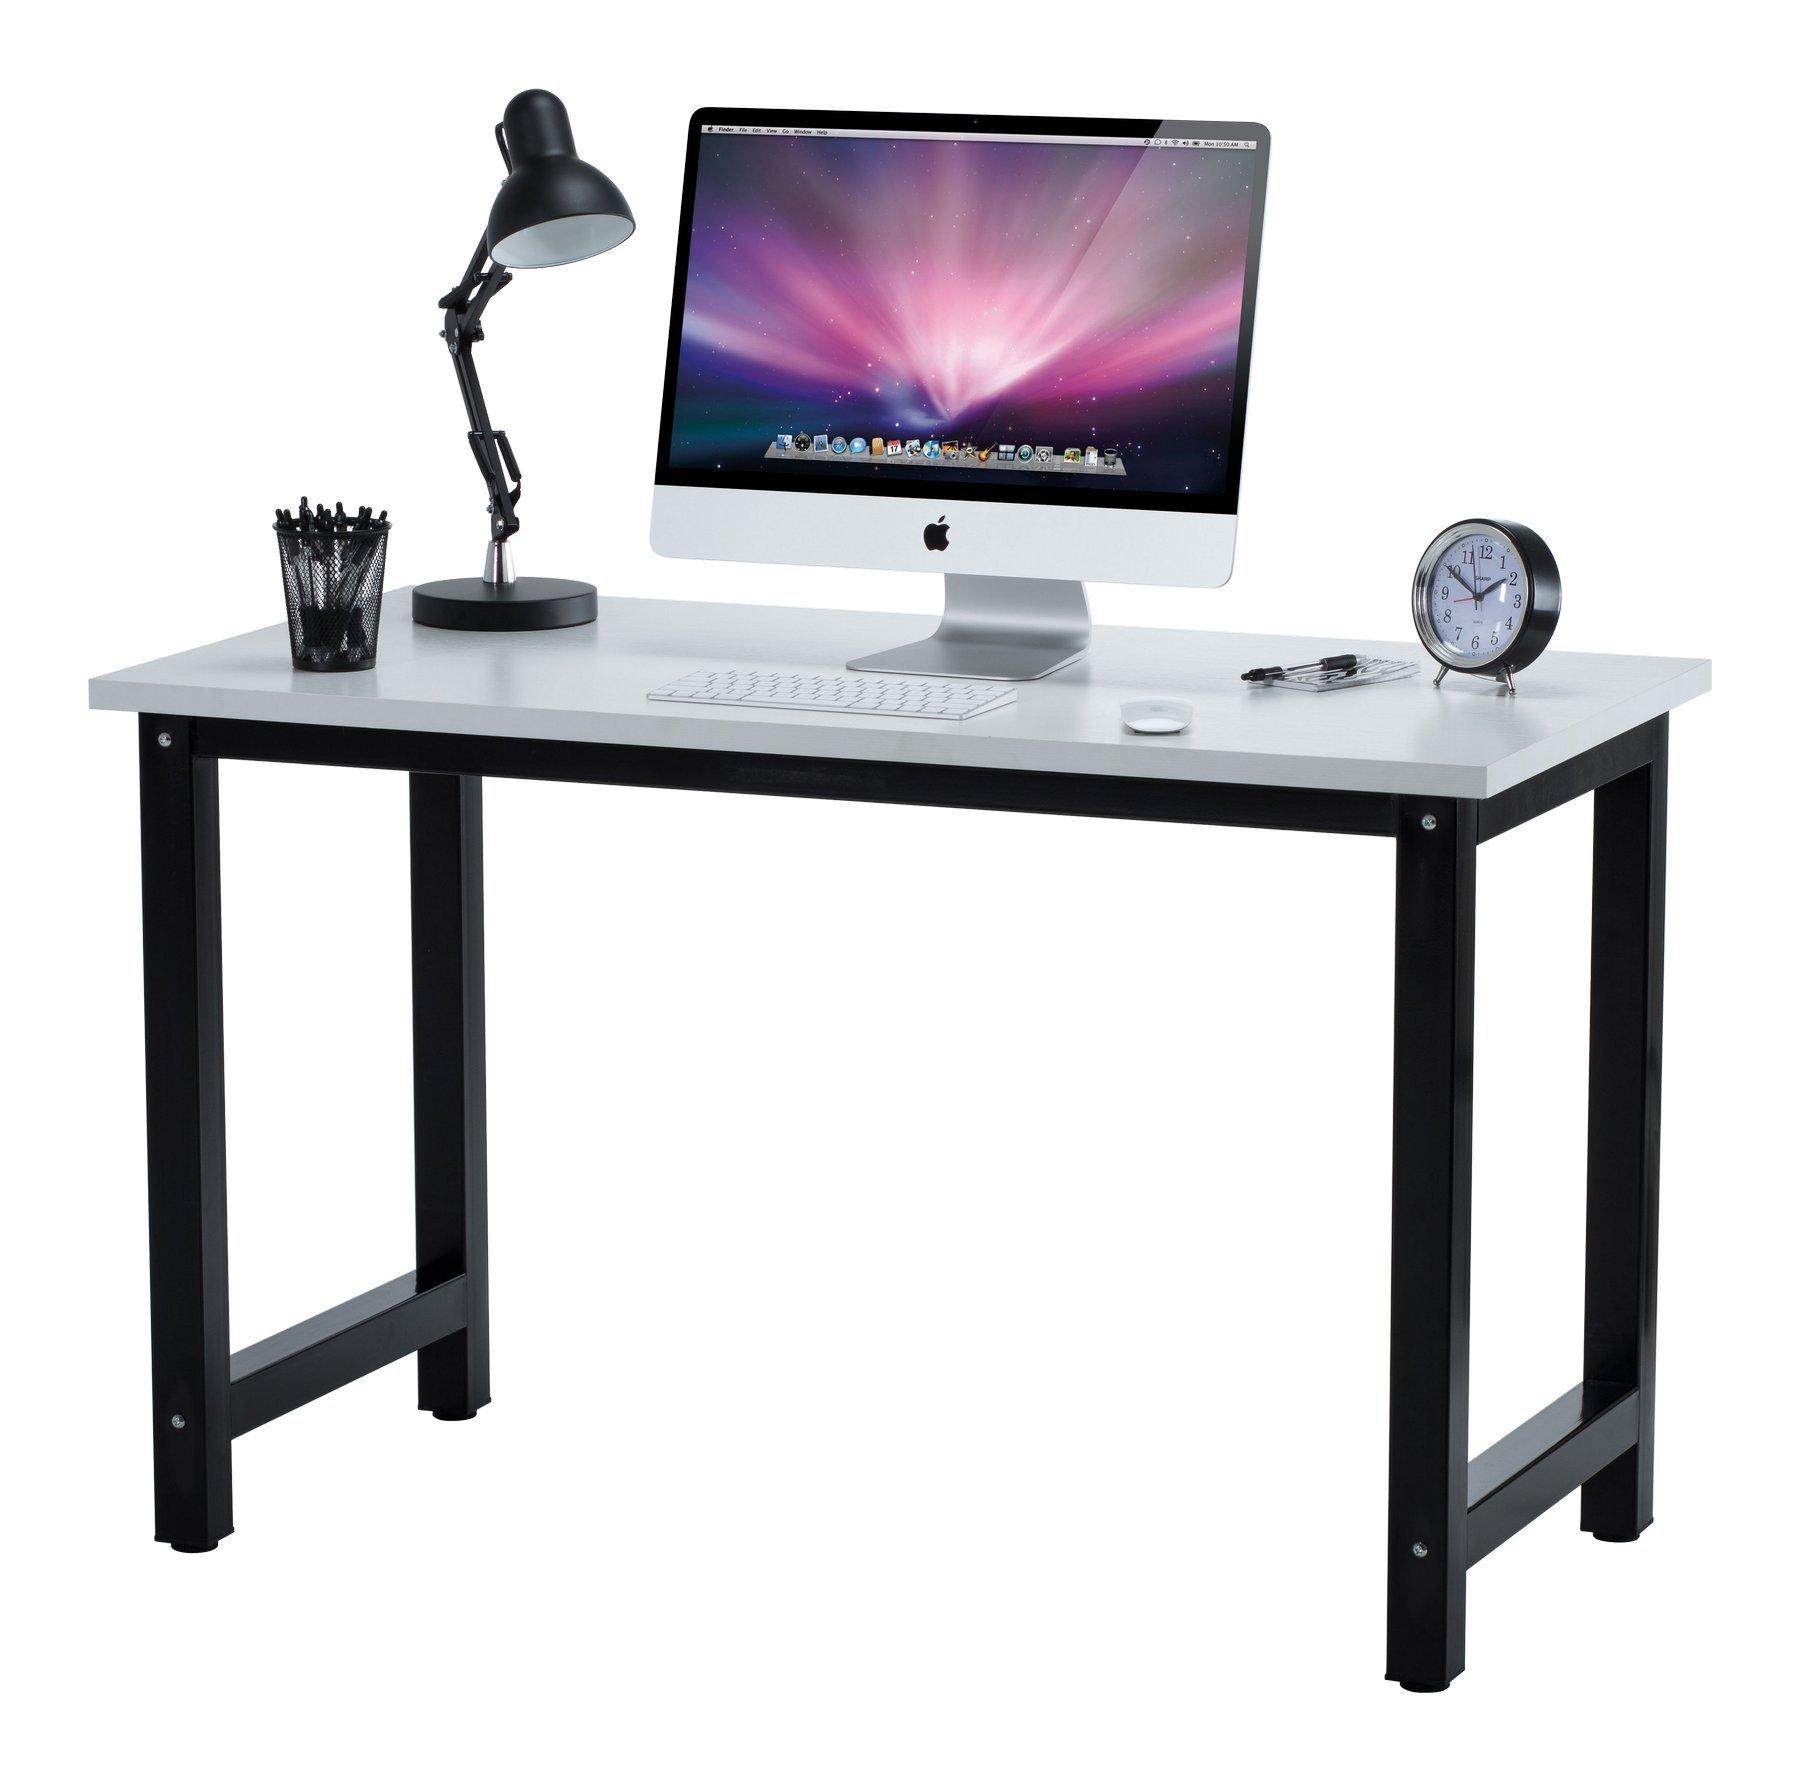 "Fineboard 47"" Stylish Home Office Computer Desk Writing Table Elegant & Modern Design, White/Black"